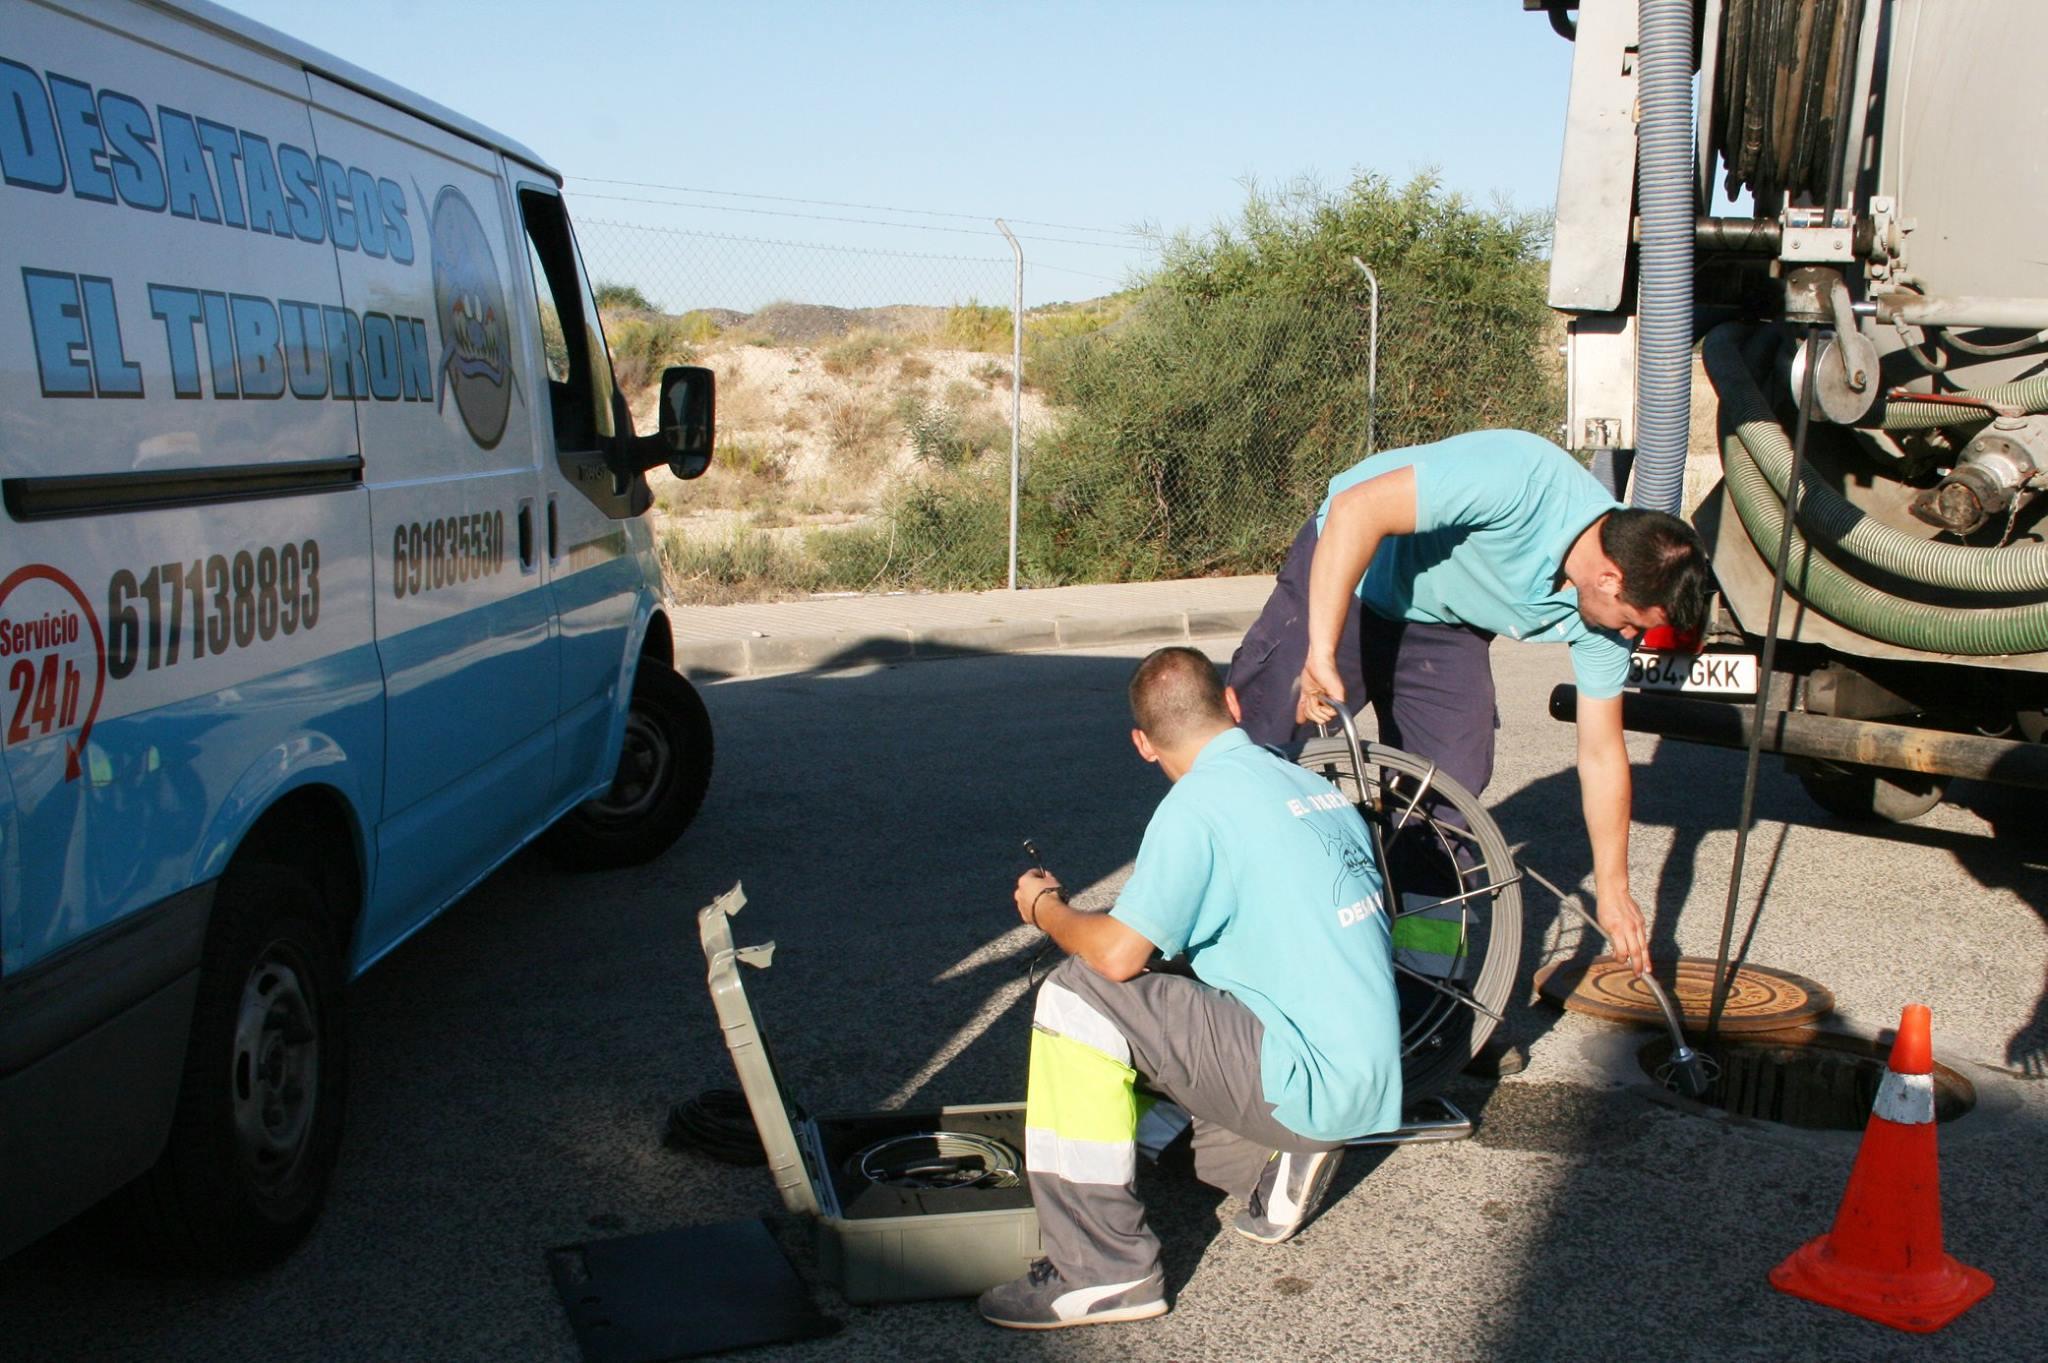 Arreglo de tuberías sin obra,  desatranco, desatasco en San Vicente del Raspeig, Mutxamel,  San Juan de Alicante, Playa de San Juan